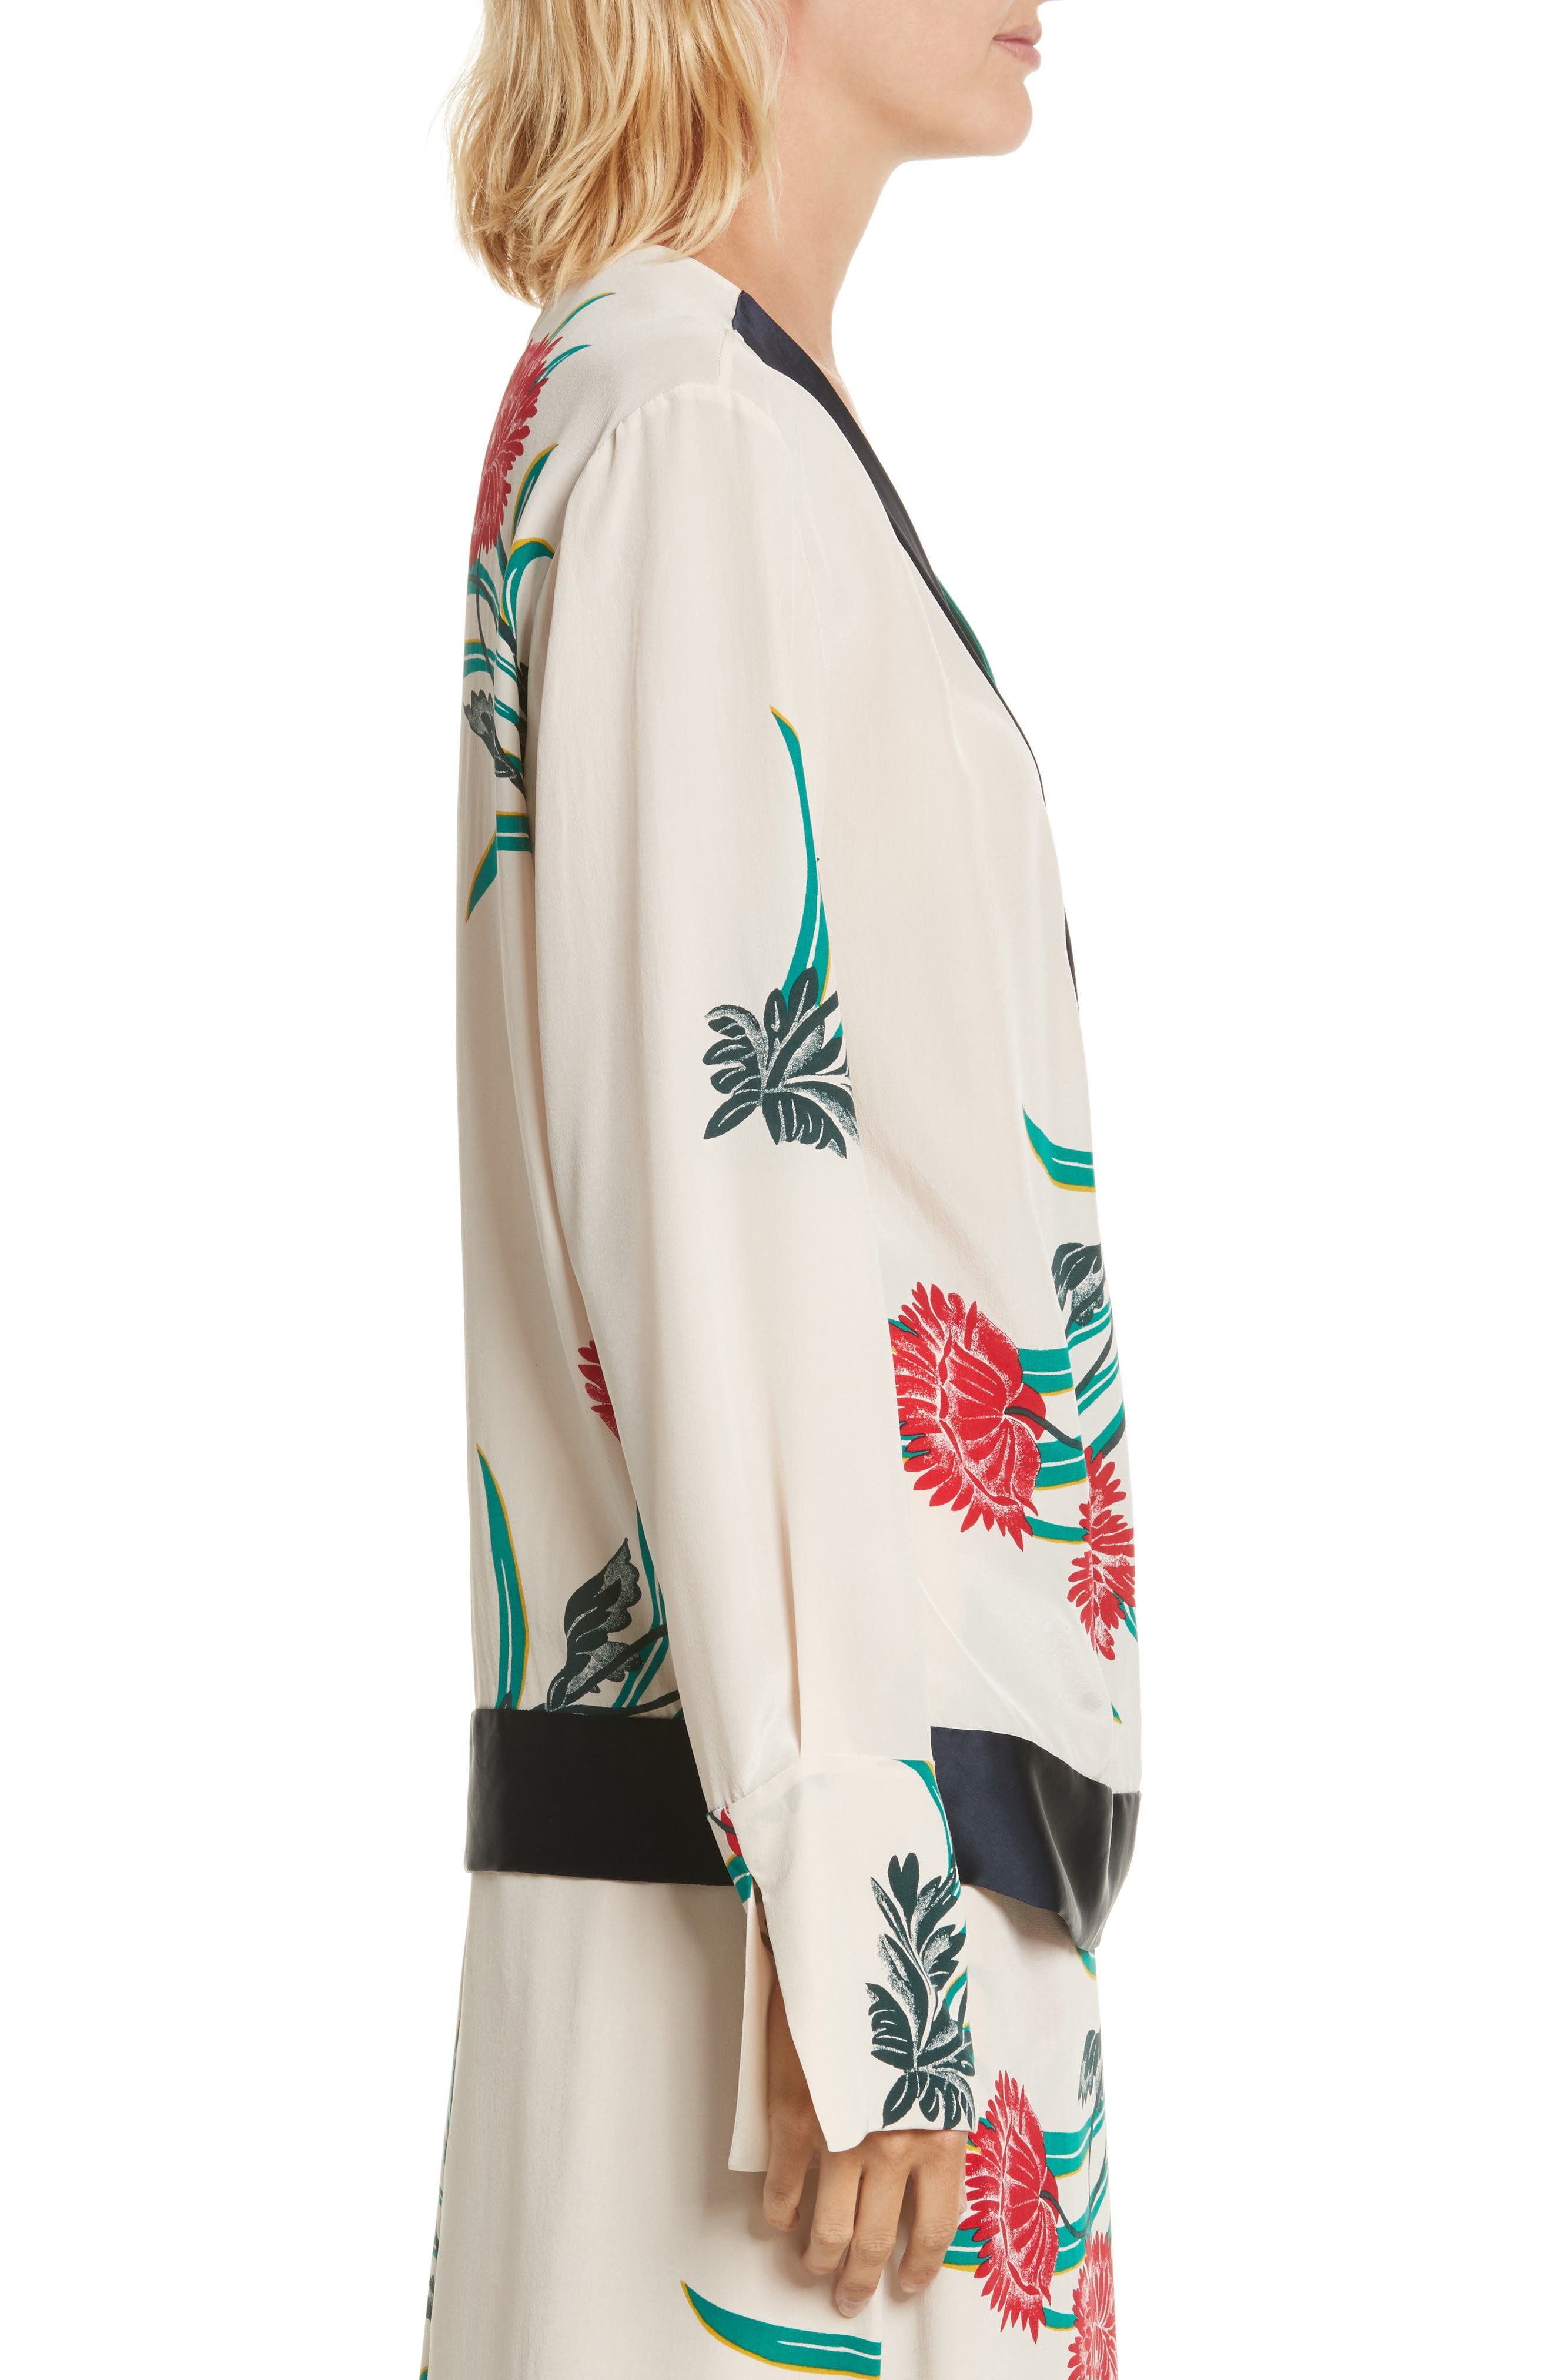 Diane von Furstenberg Bell Sleeve Crossover Silk Blouse,                             Alternate thumbnail 3, color,                             Farren Pearl/ Alex Navy/ Jade